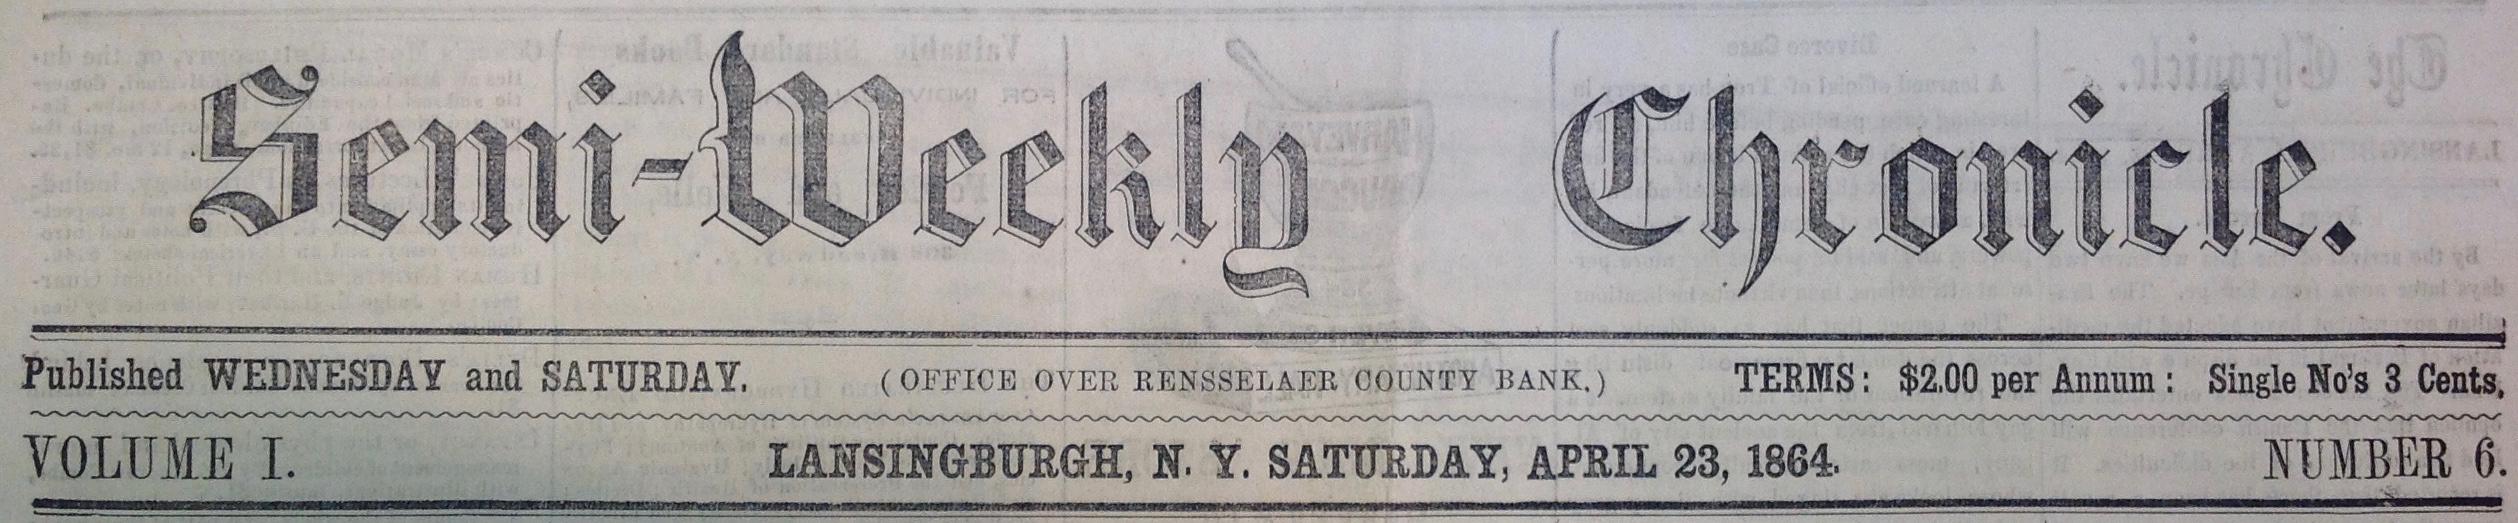 Semi-Weekly Chronicle. (Masthead.)